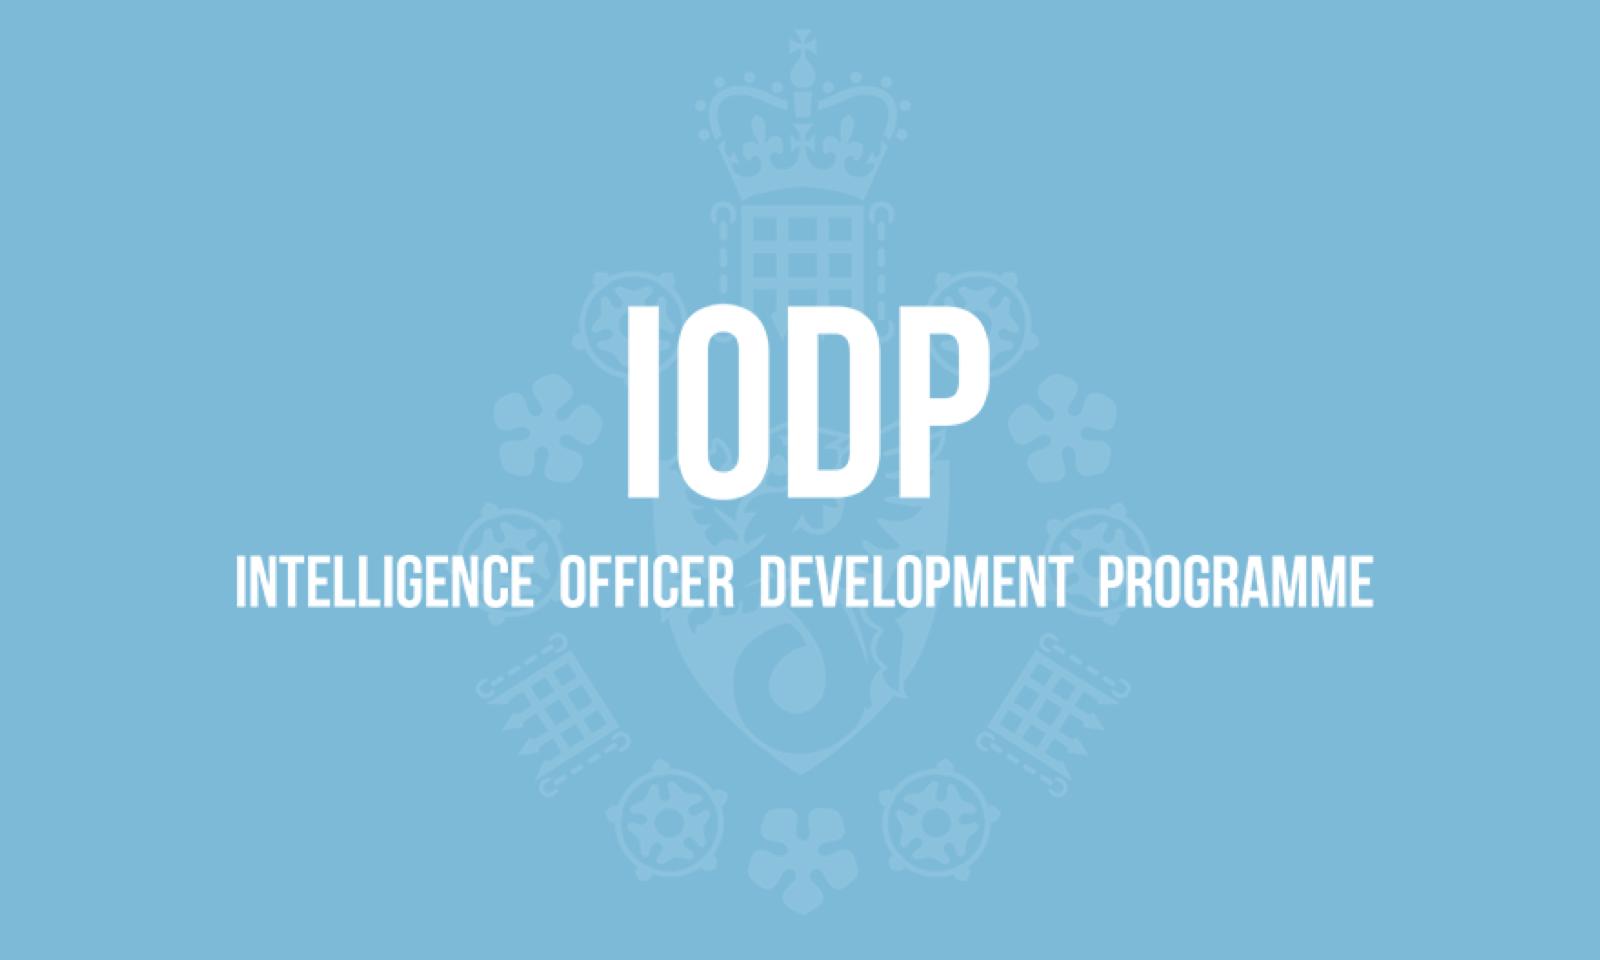 (IODP) Intelligence Officer Development Programme